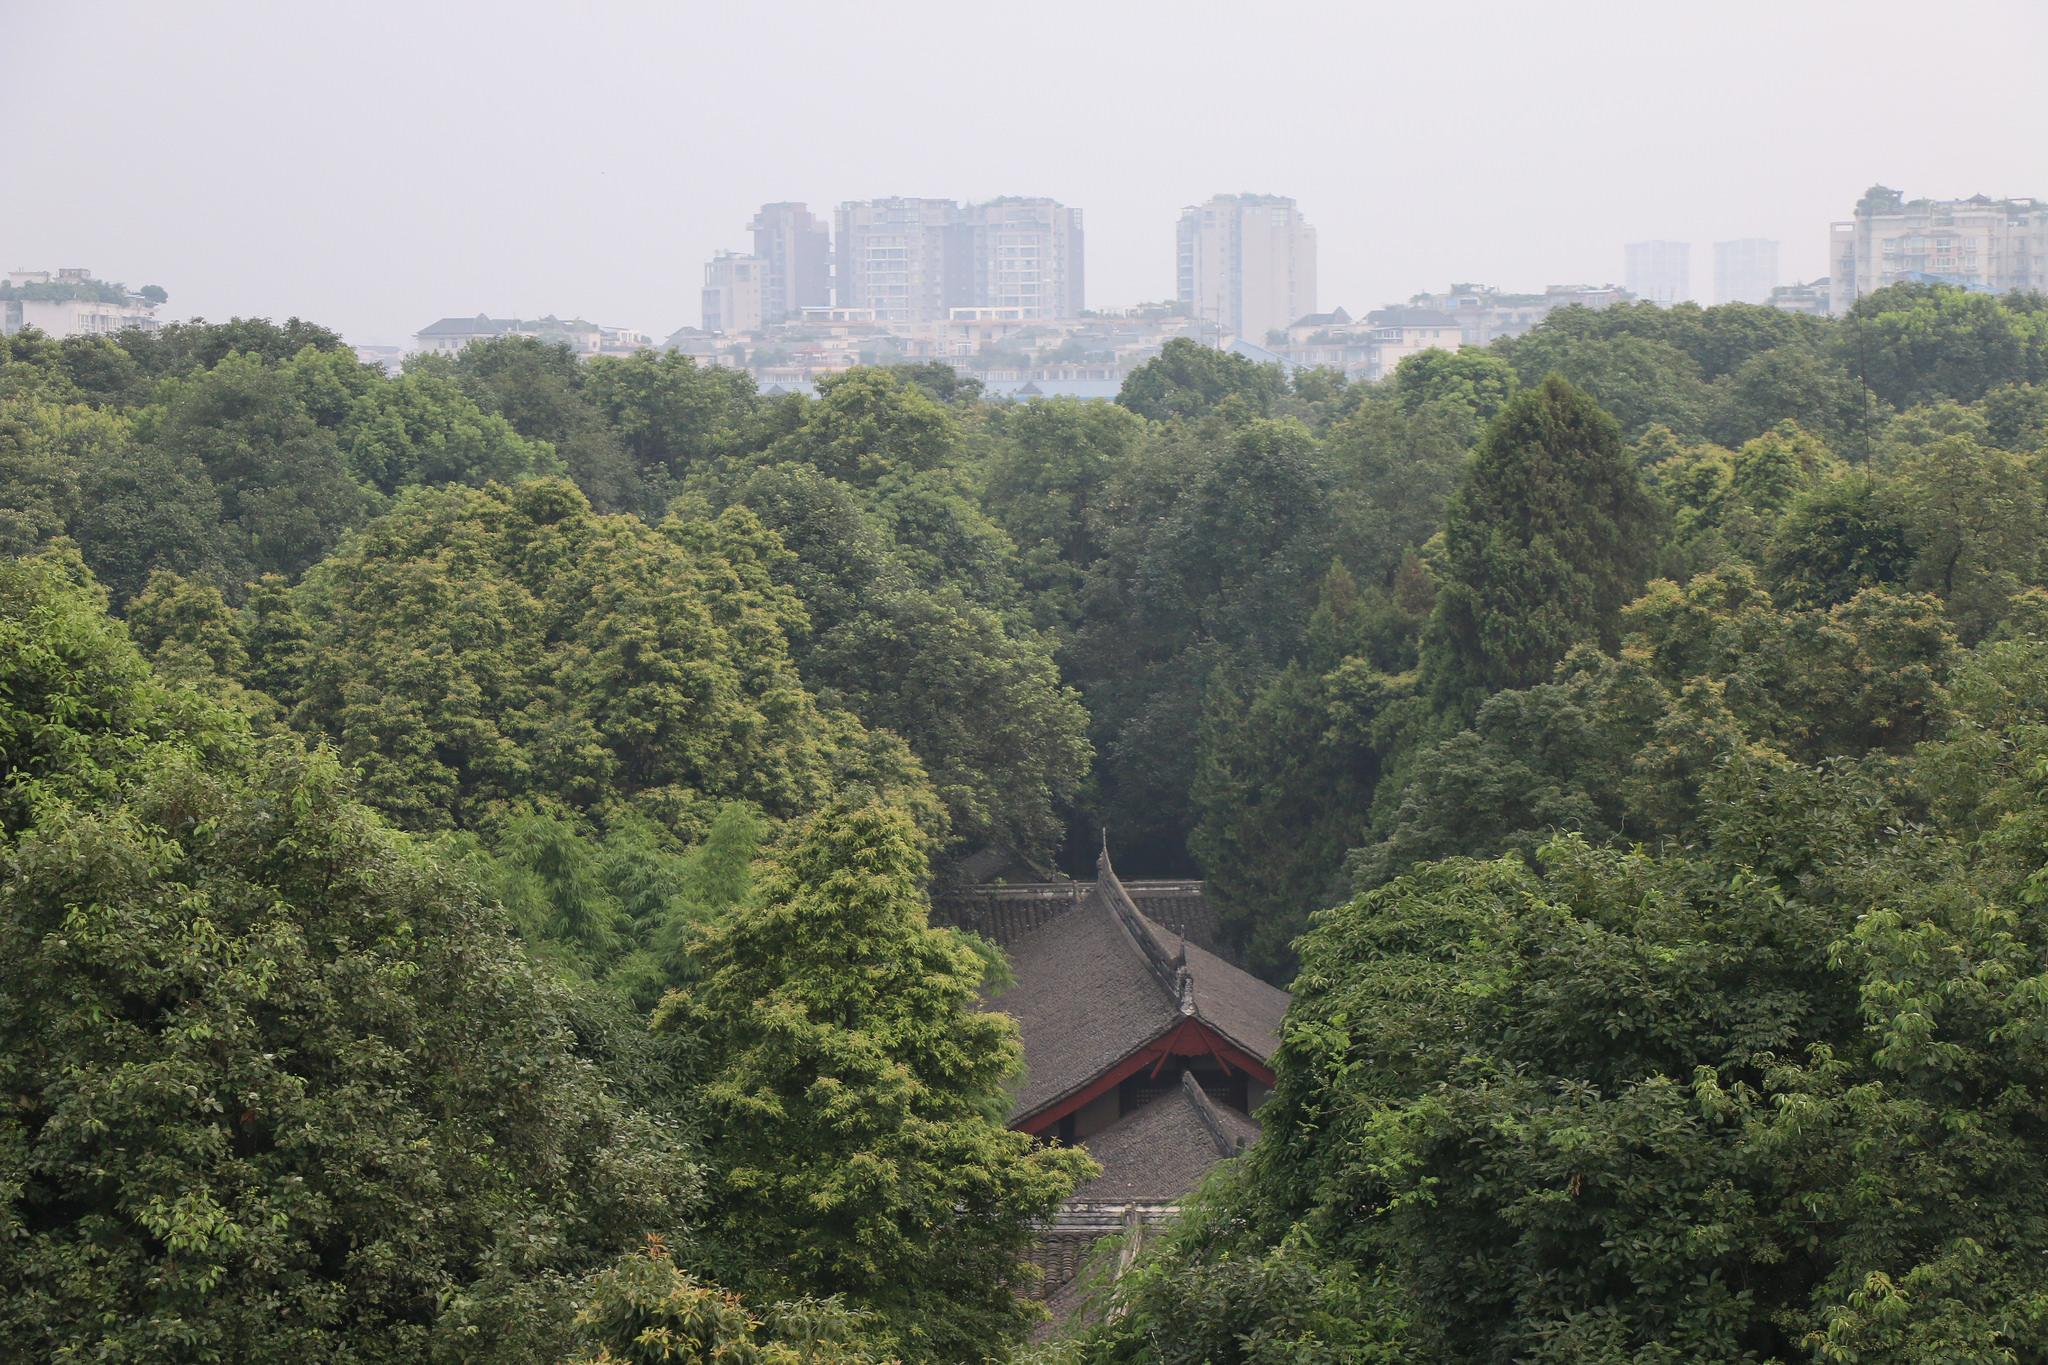 Chengdu, China_23449474179_l.jpg